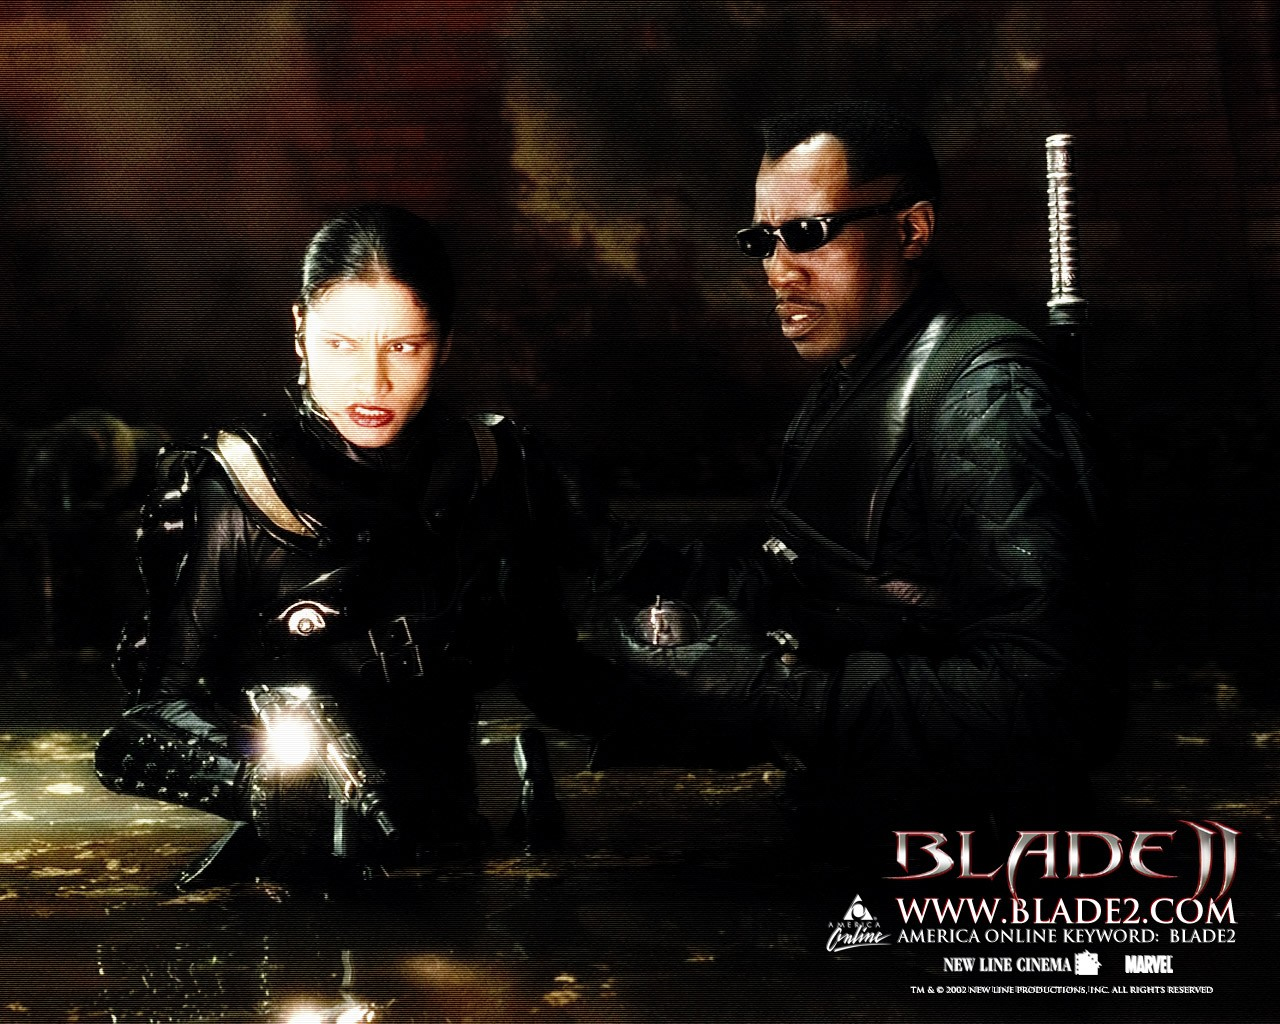 Un wallpaper del film Blade II con Wesley Snipes e Leonor Varela